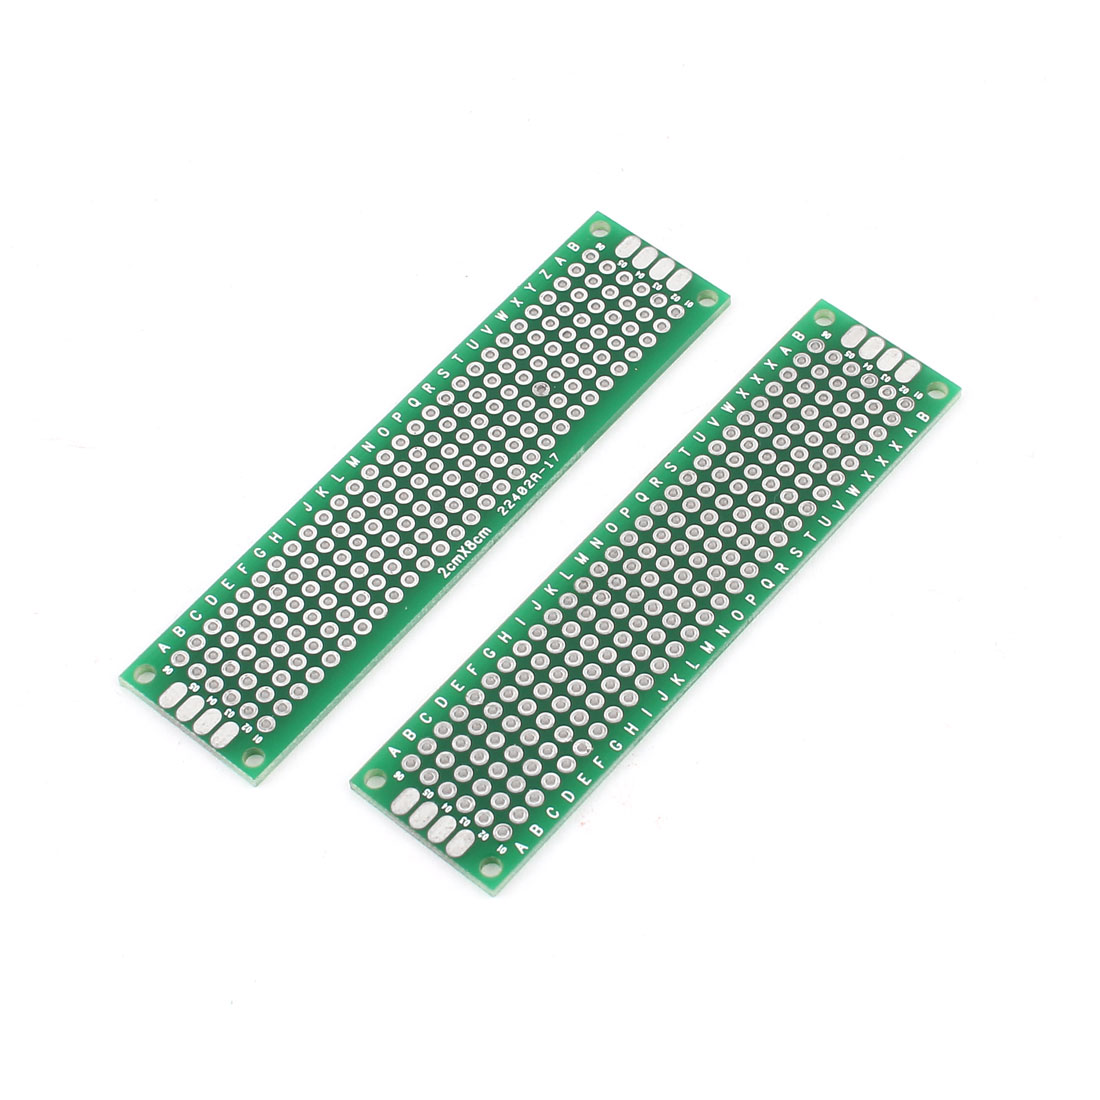 2 Pcs Universal Dual Side DIY Prototype PCB Board 2cmx8cm